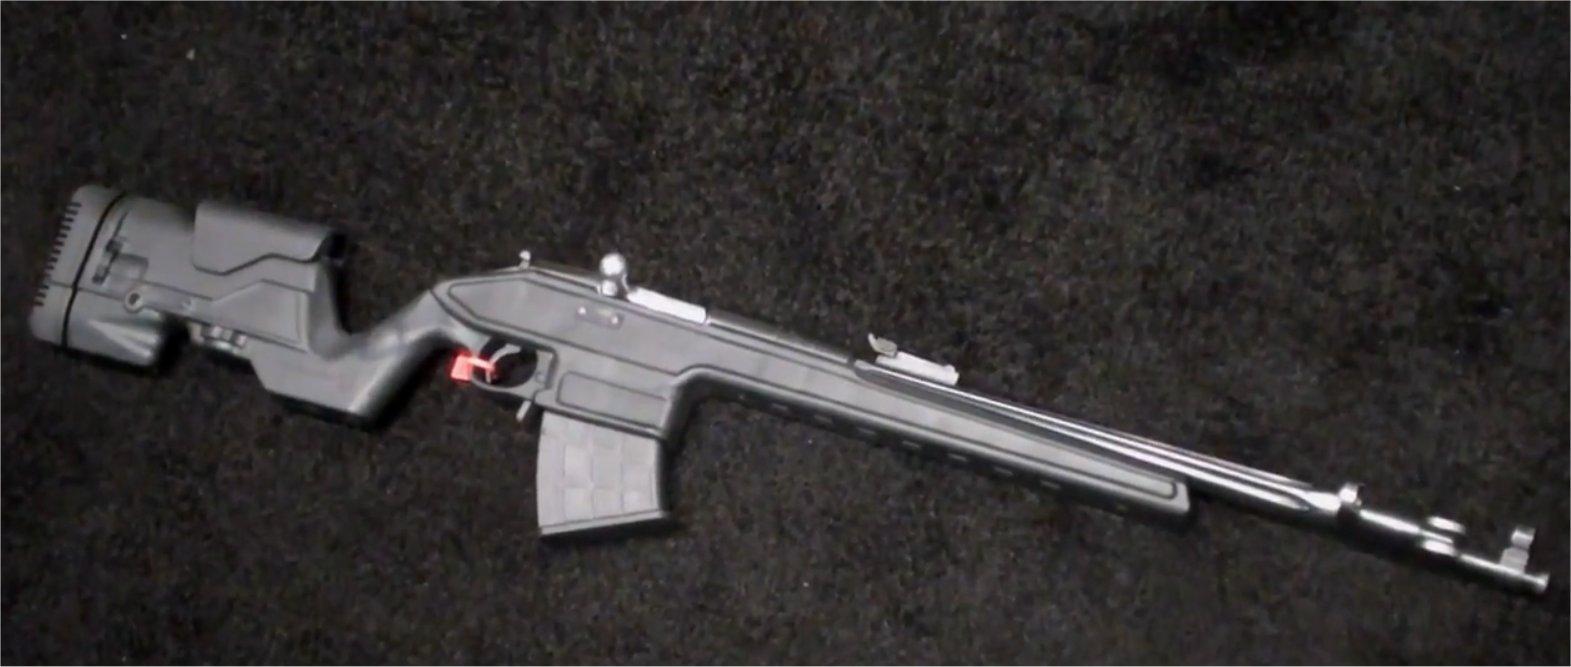 Archangel Mosin Stock Archive Page 2 The Ak Files Forums Spray Tool Work Bench Part Diagram Nagant Rifle Gun Mat Ebay